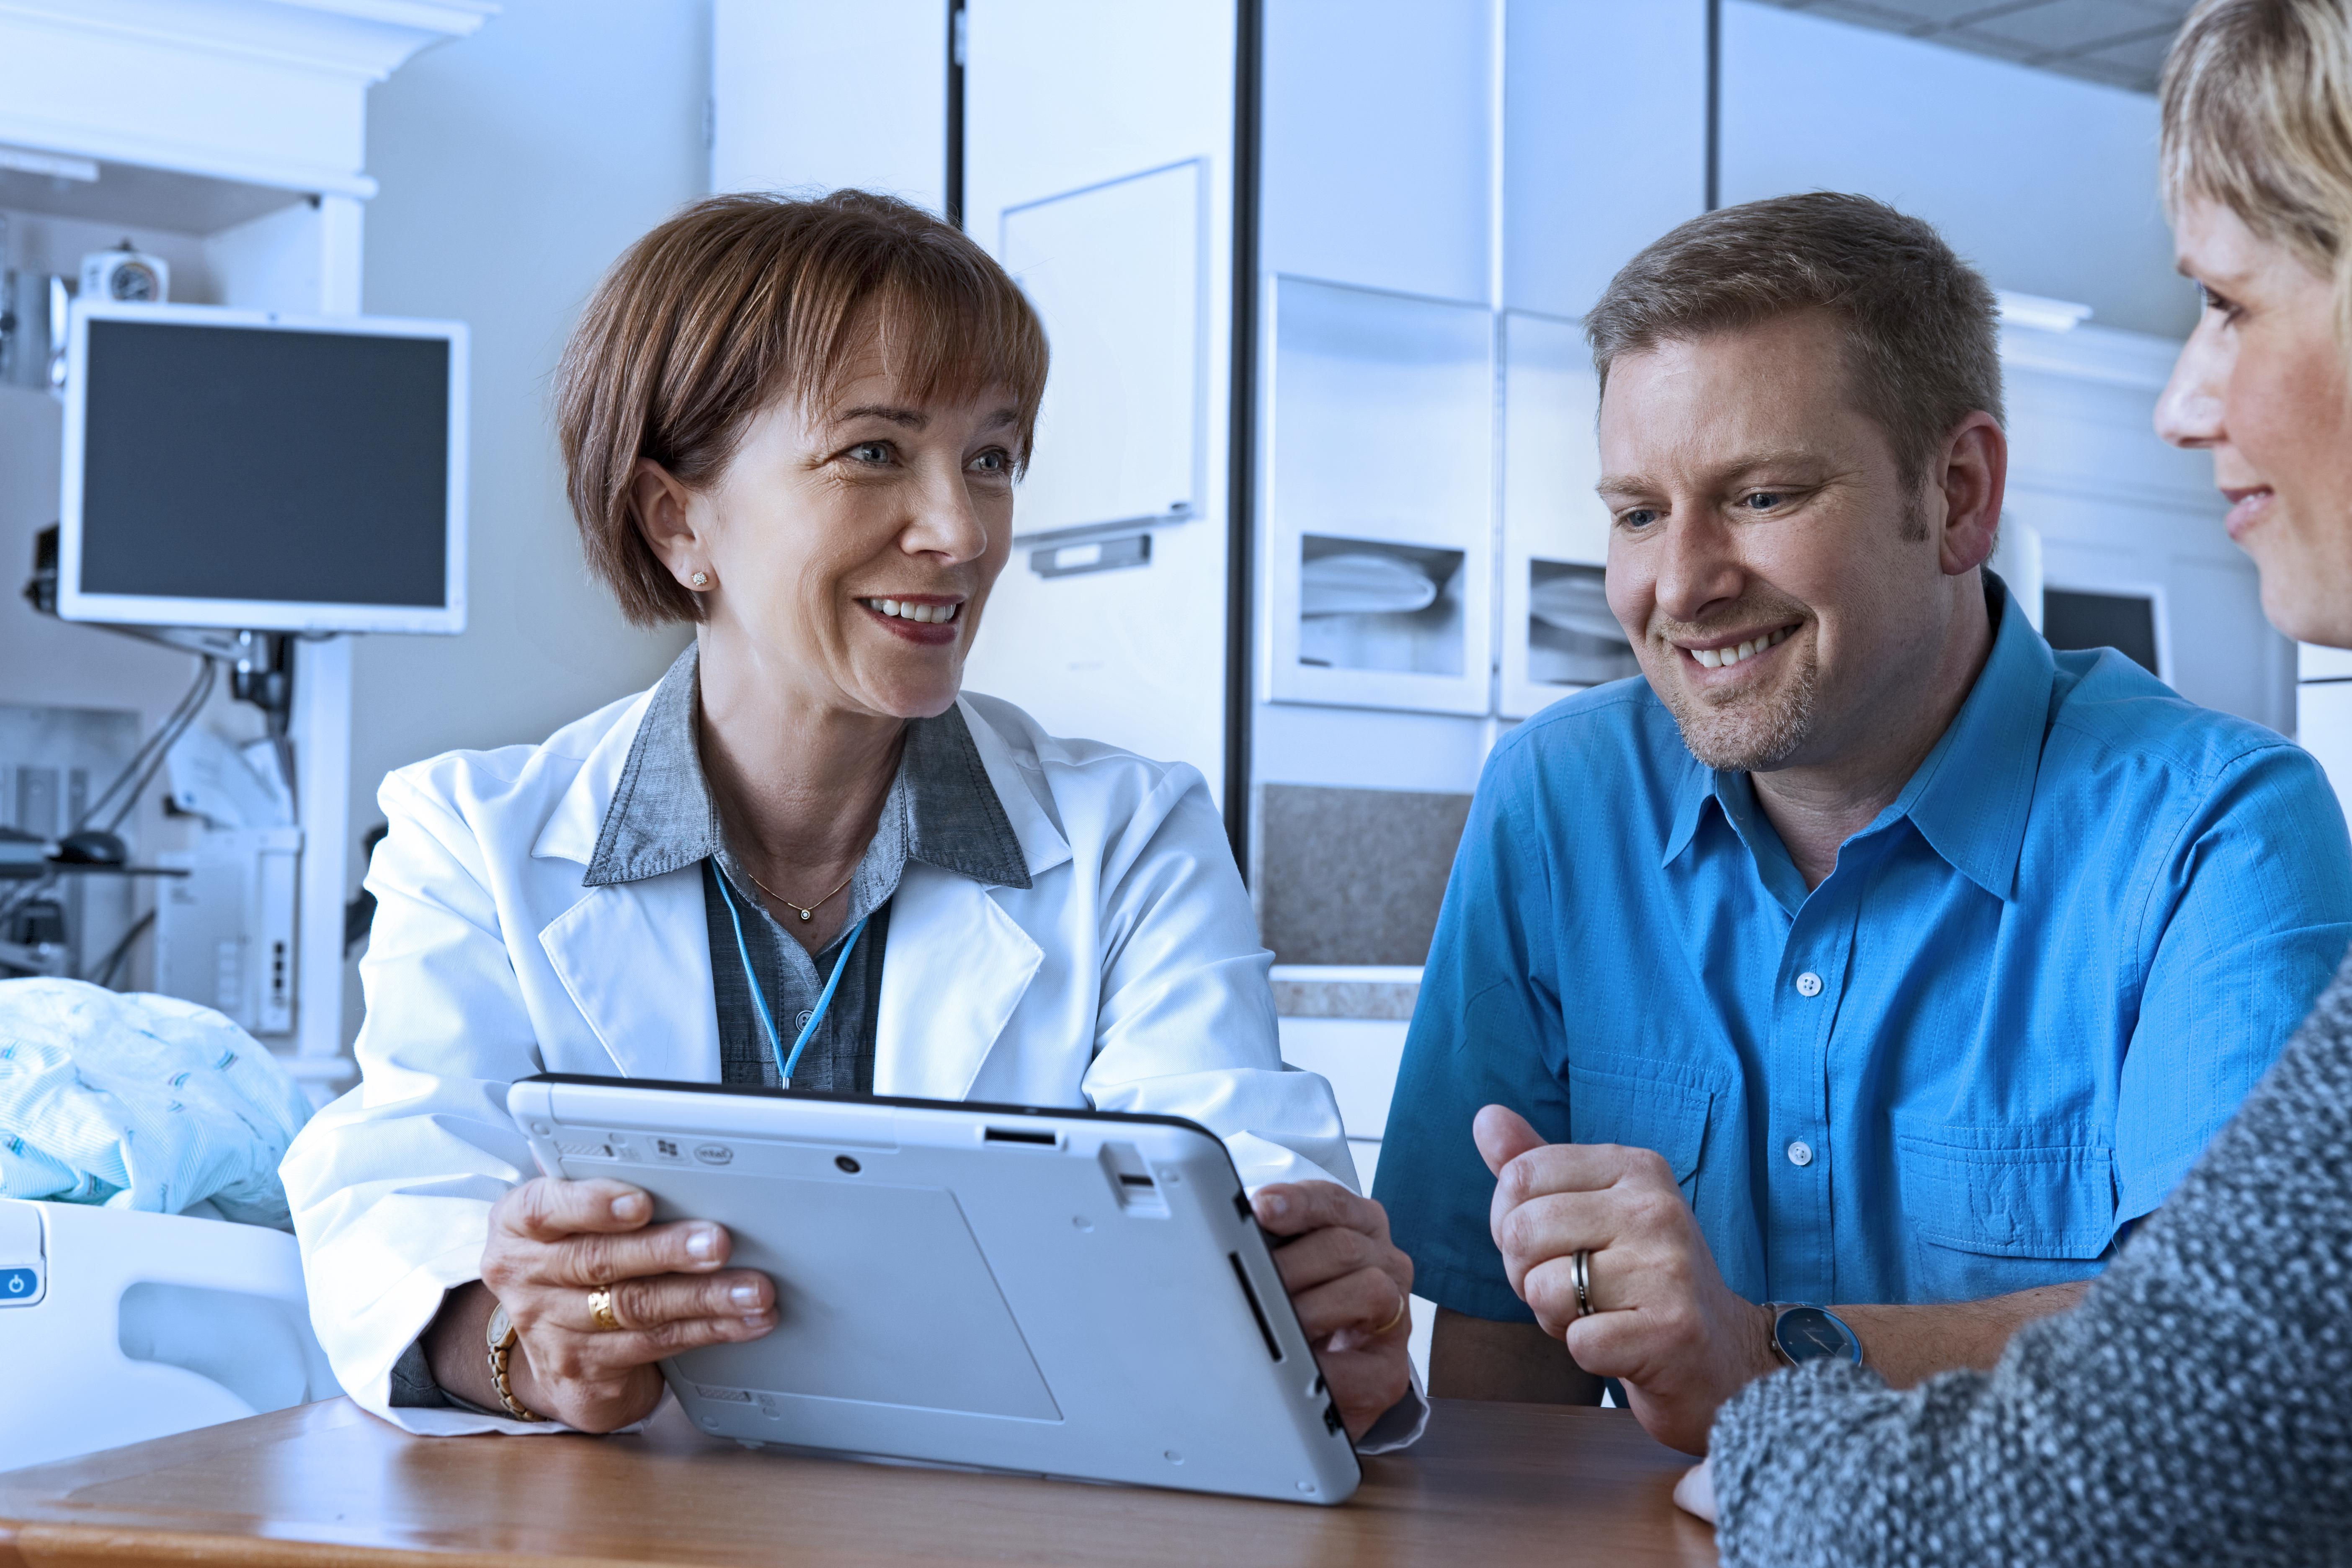 Doctor_Patient_Family_Tablet.jpg